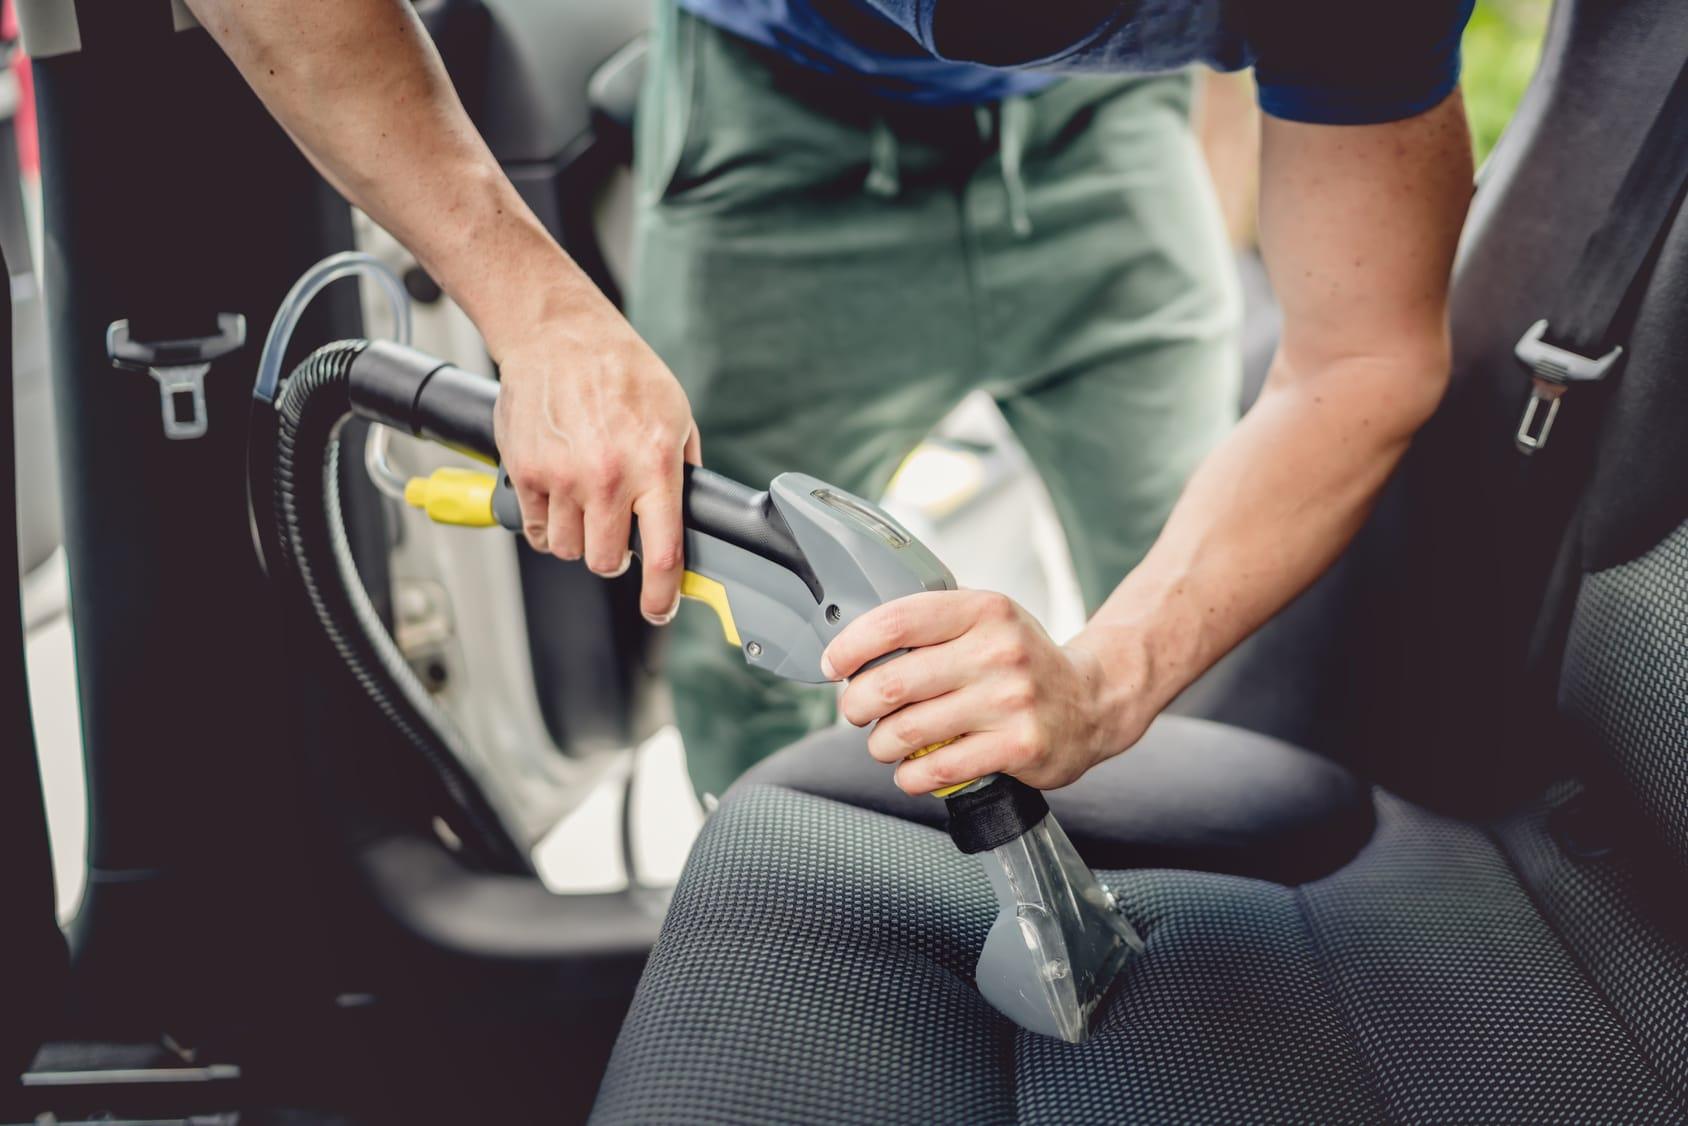 Autopolster Reinigen 7 Tipps Tricks Haushaltstipps Net